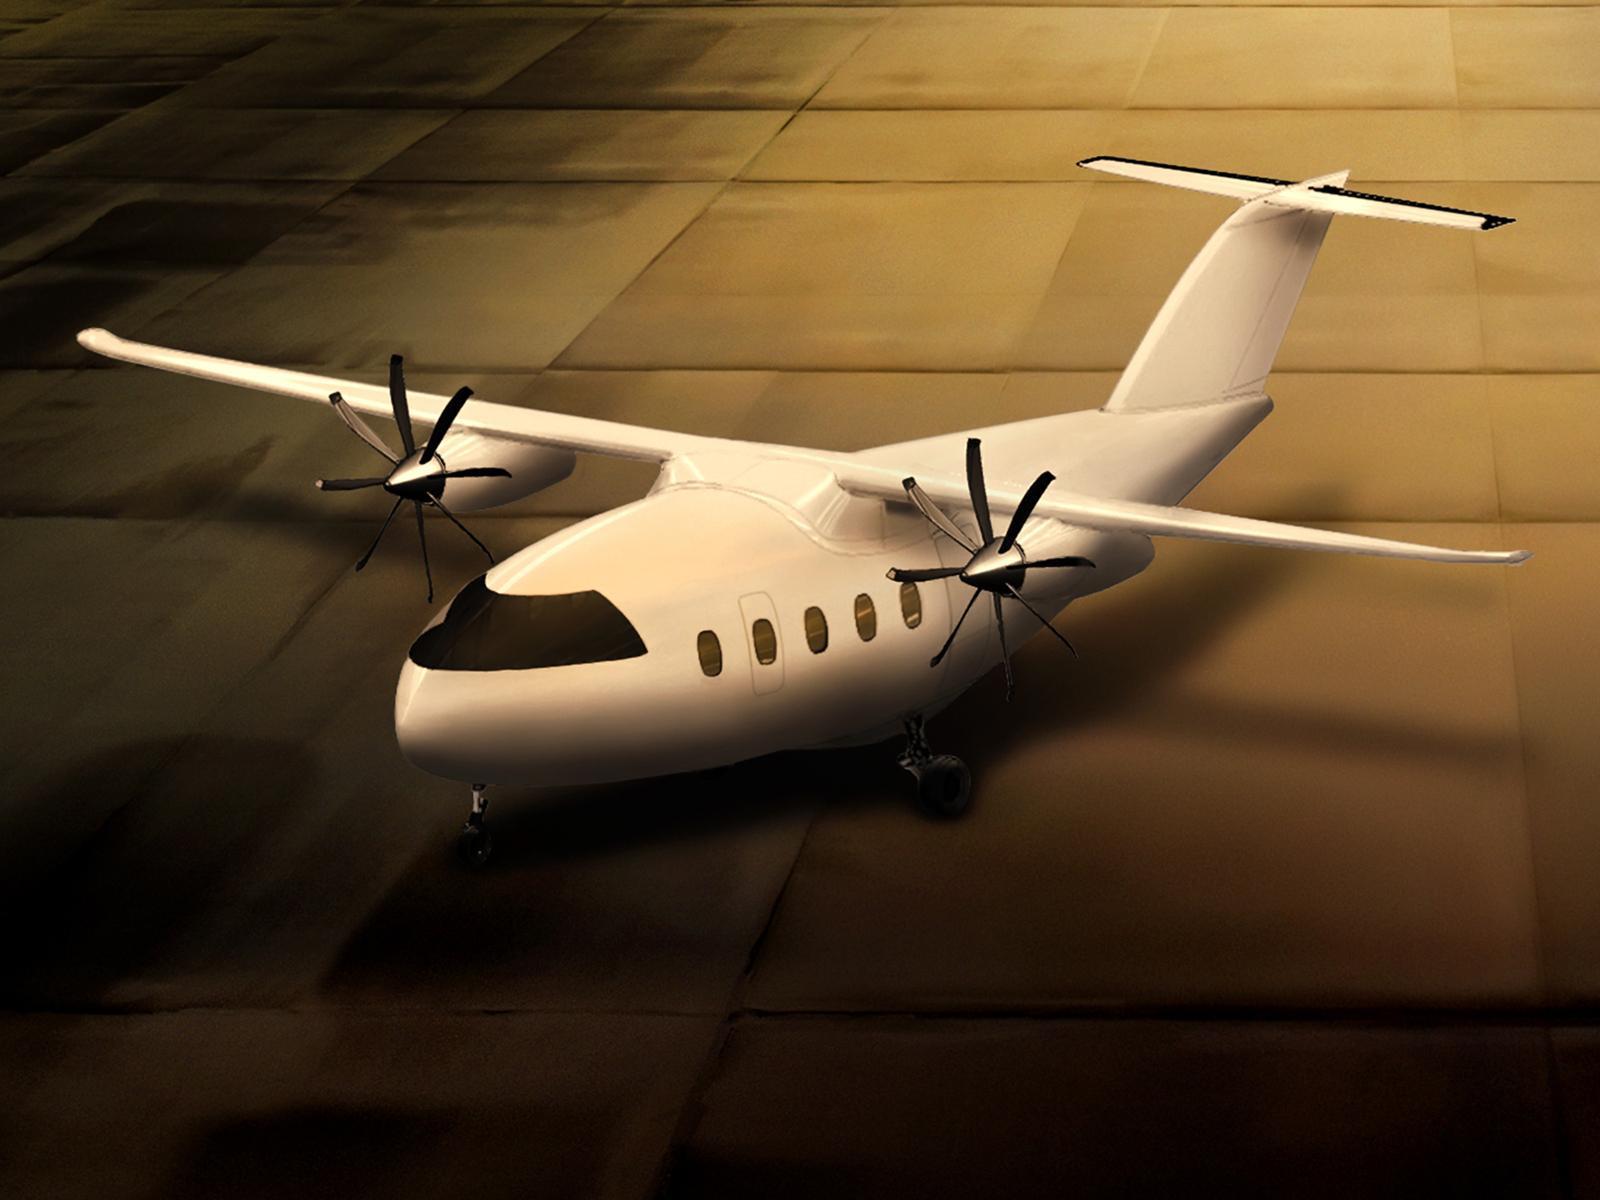 small plane_1560914142819.jpg.jpg